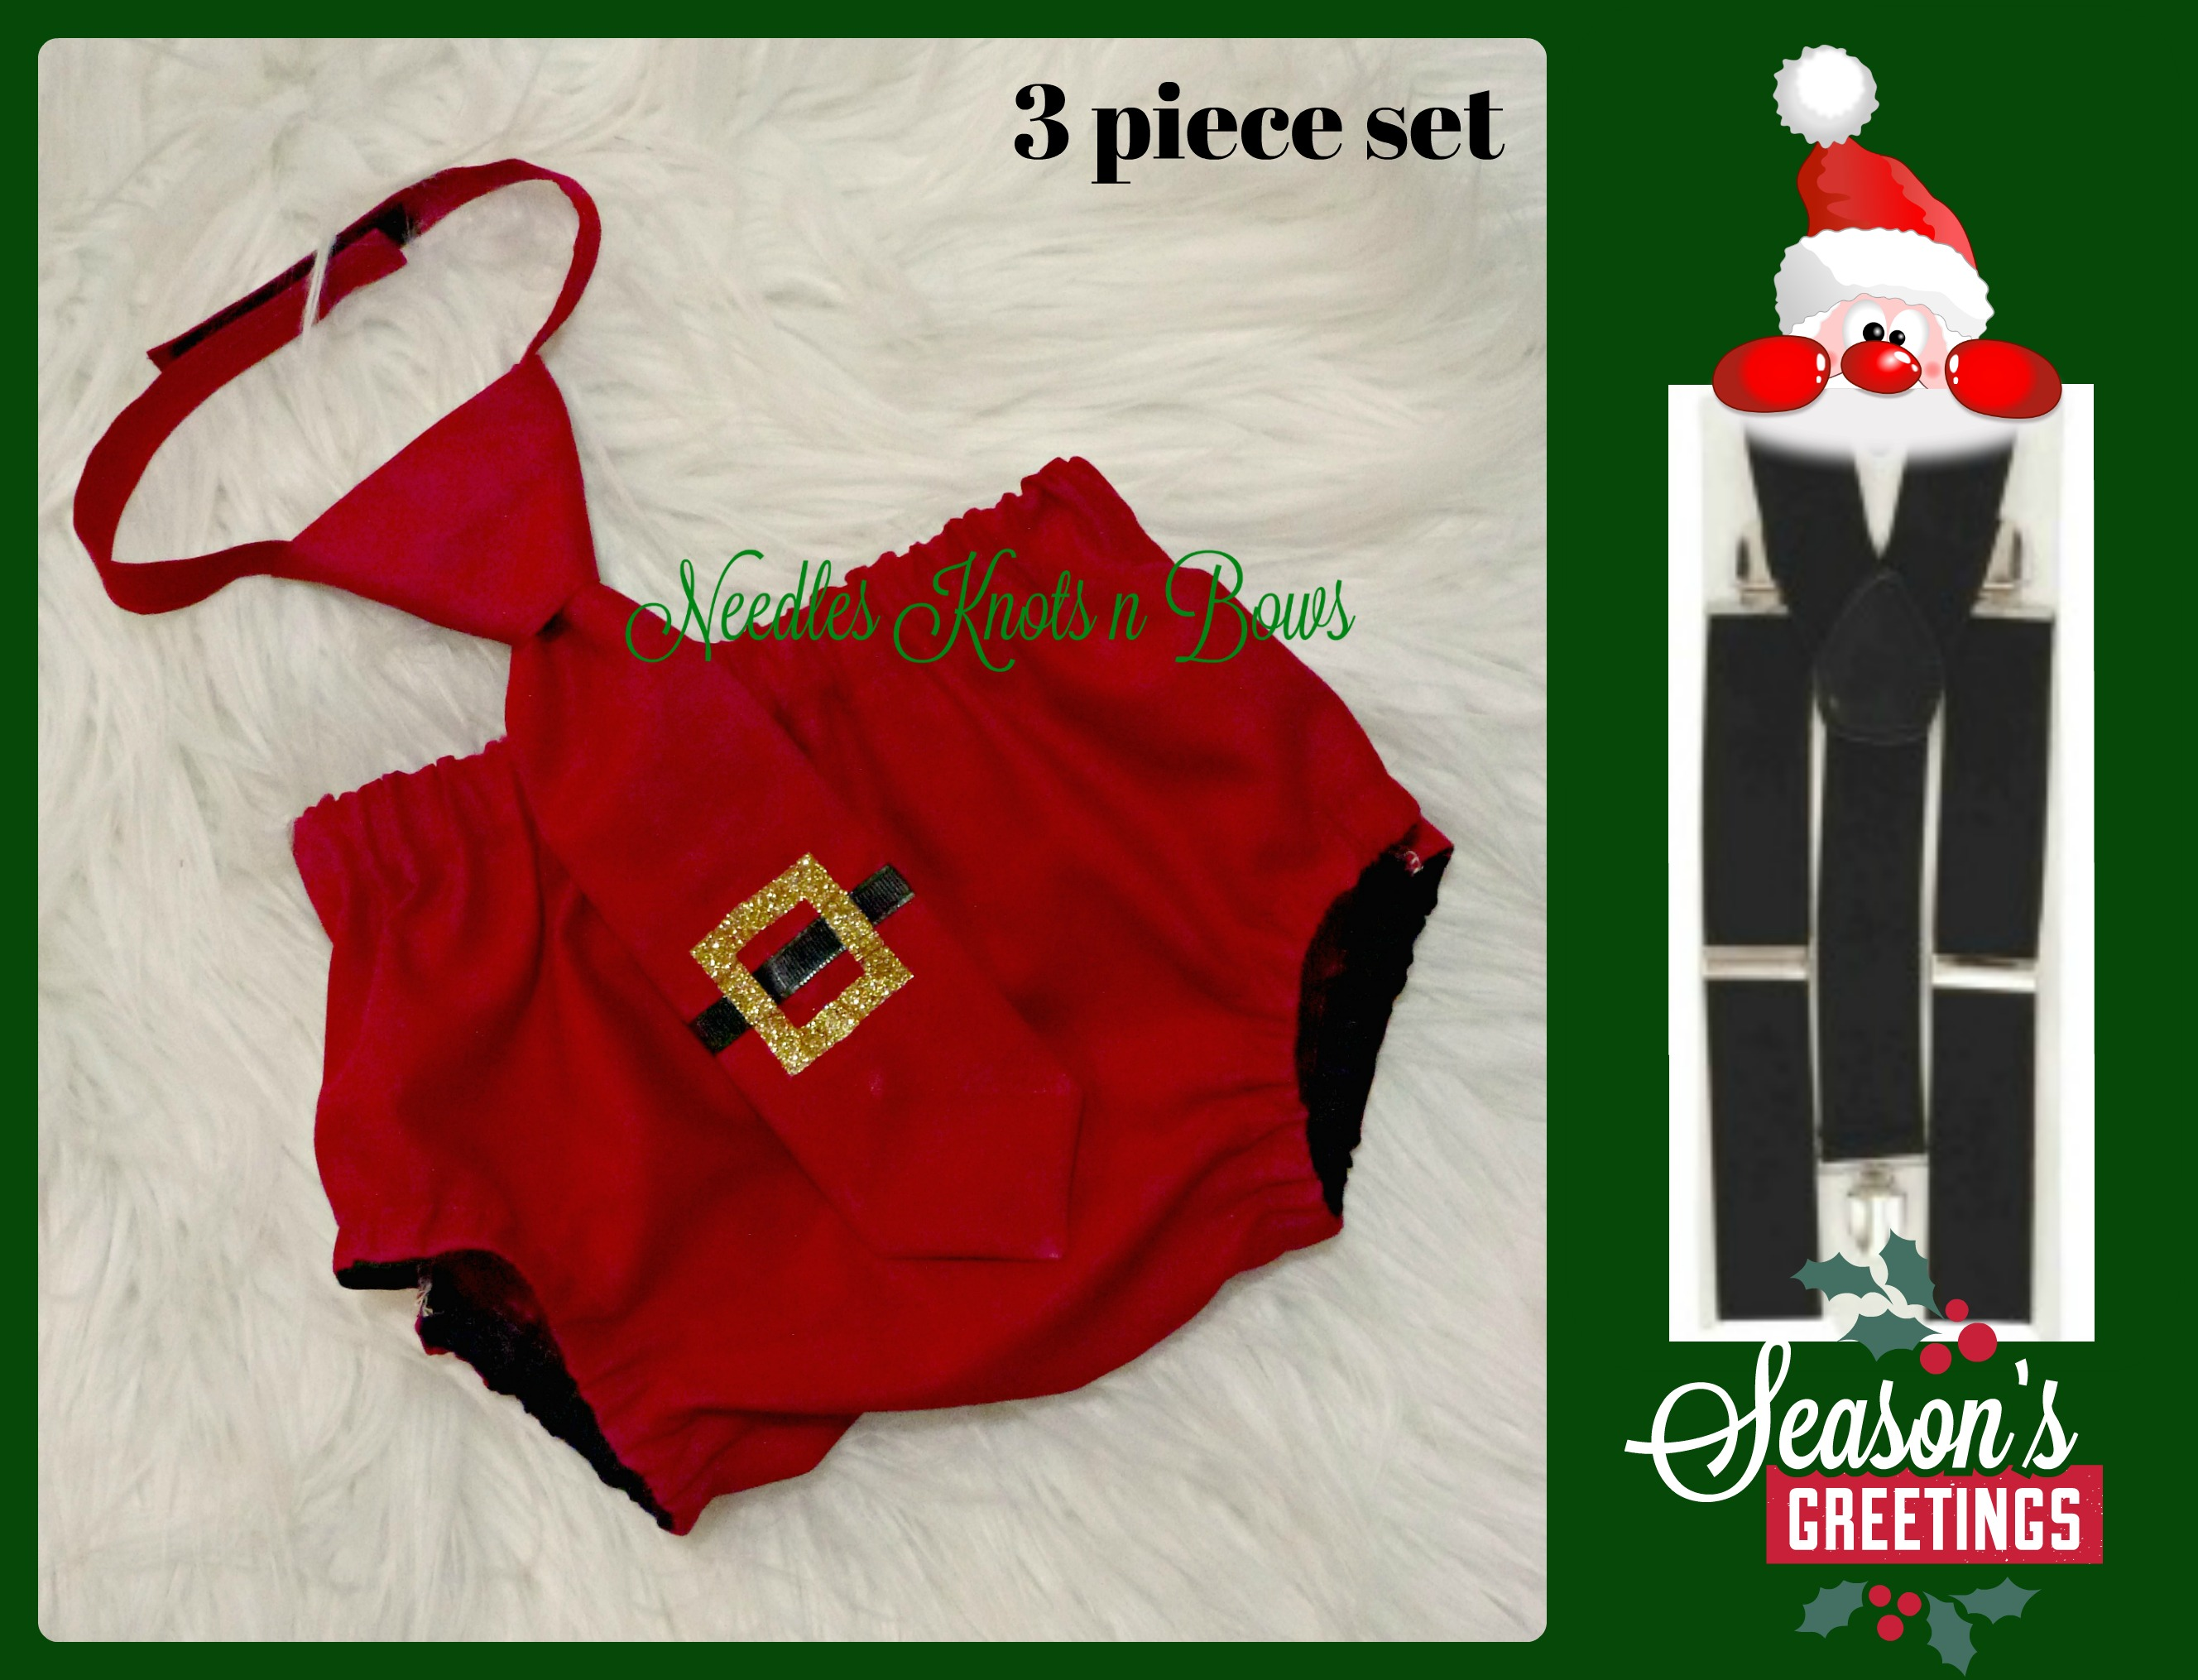 c861db0ed8242 Boys Christmas Cake Smash, Baby Boys 1st Christmas Outfit, Photo Prop,  Santa Claus Cake Smash from Needles Knots n Bows